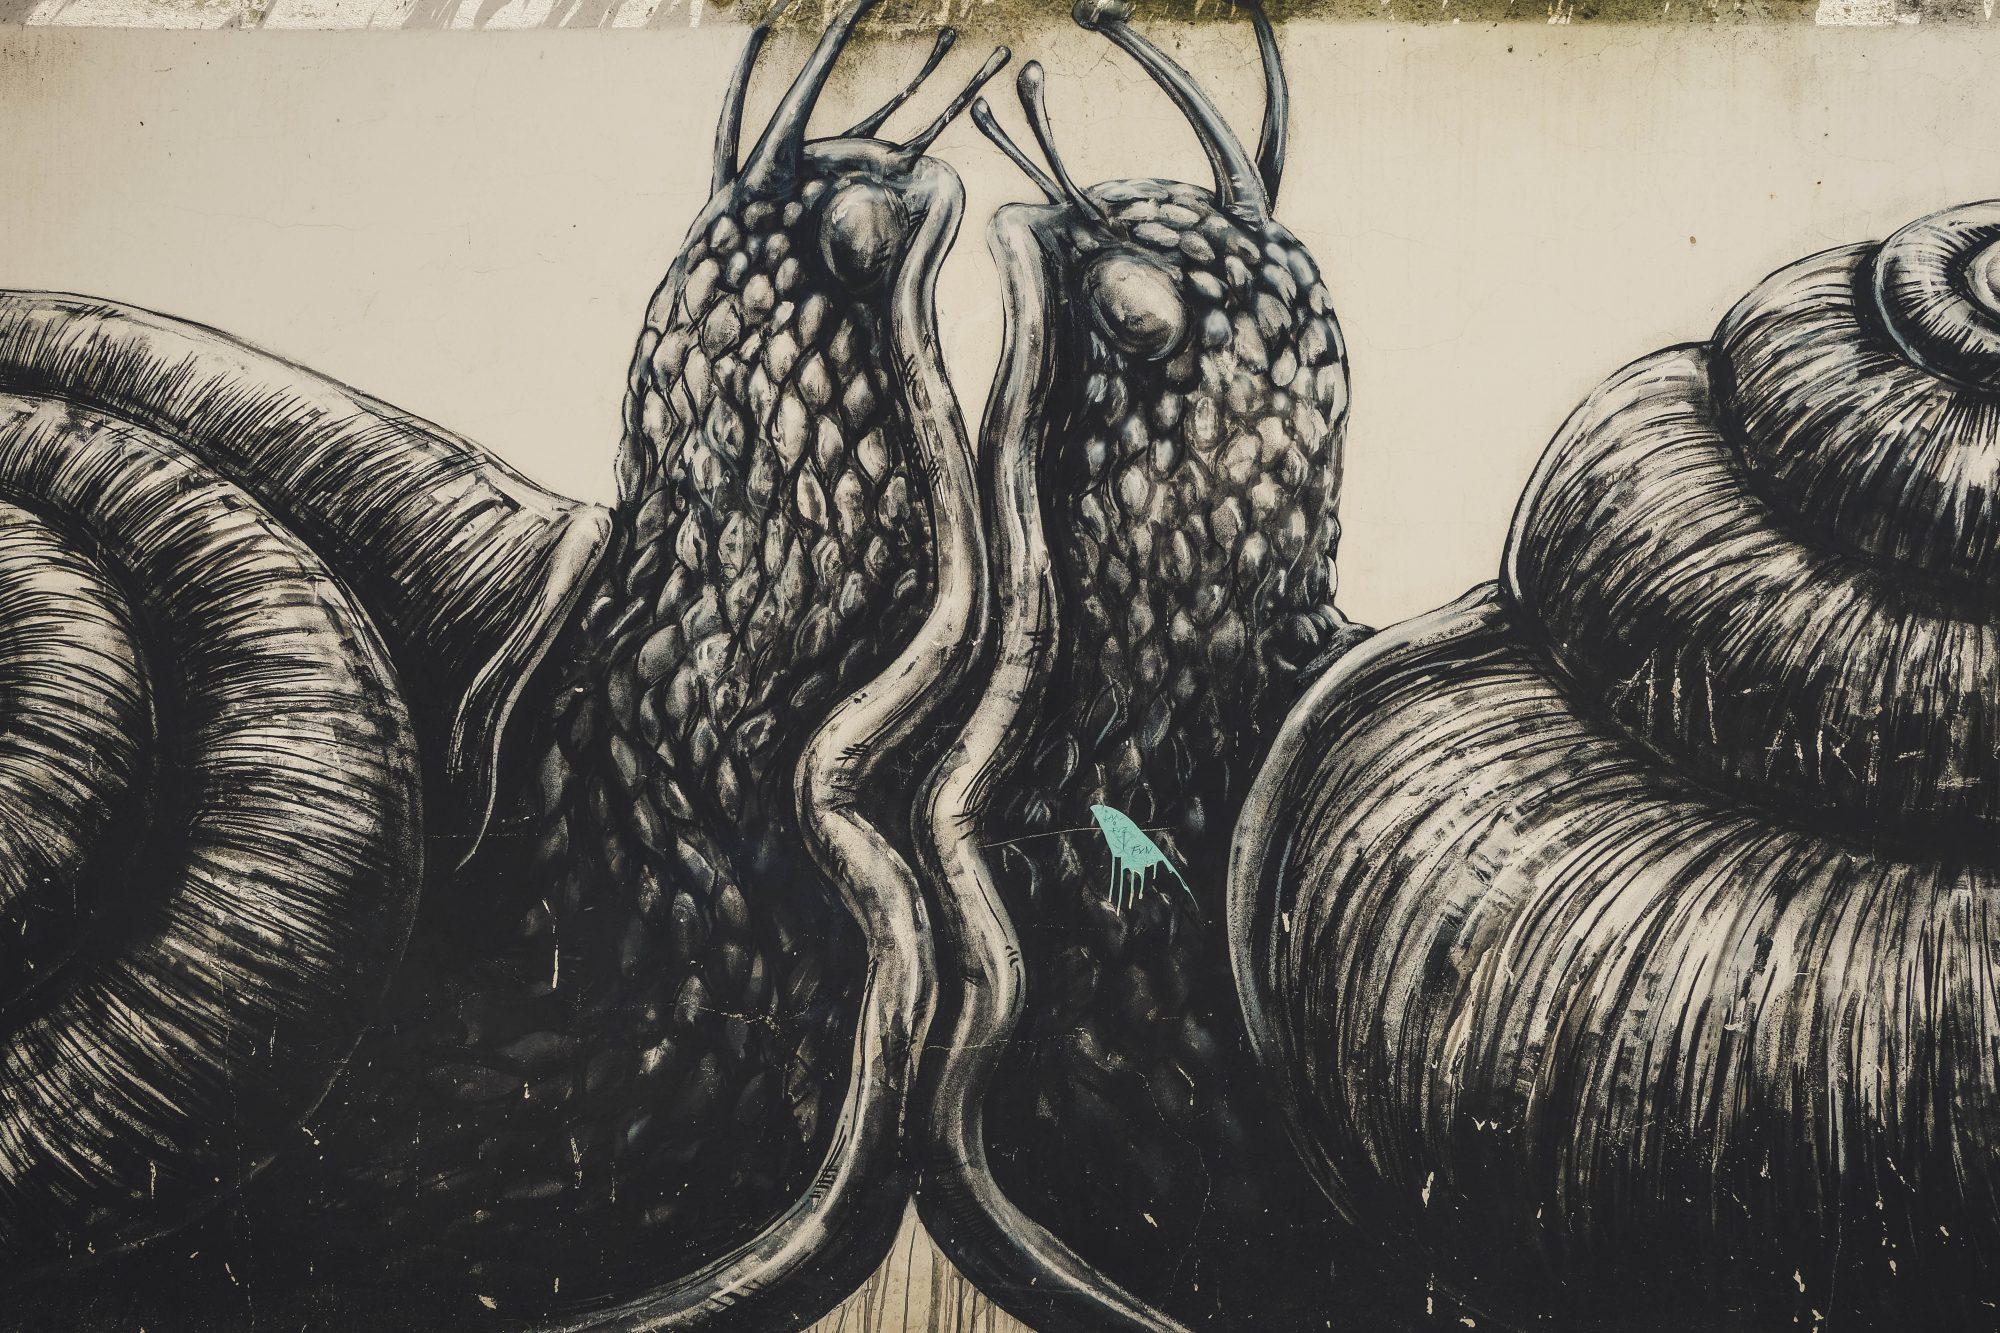 Escargots Amoureux - Lagos, Portugal